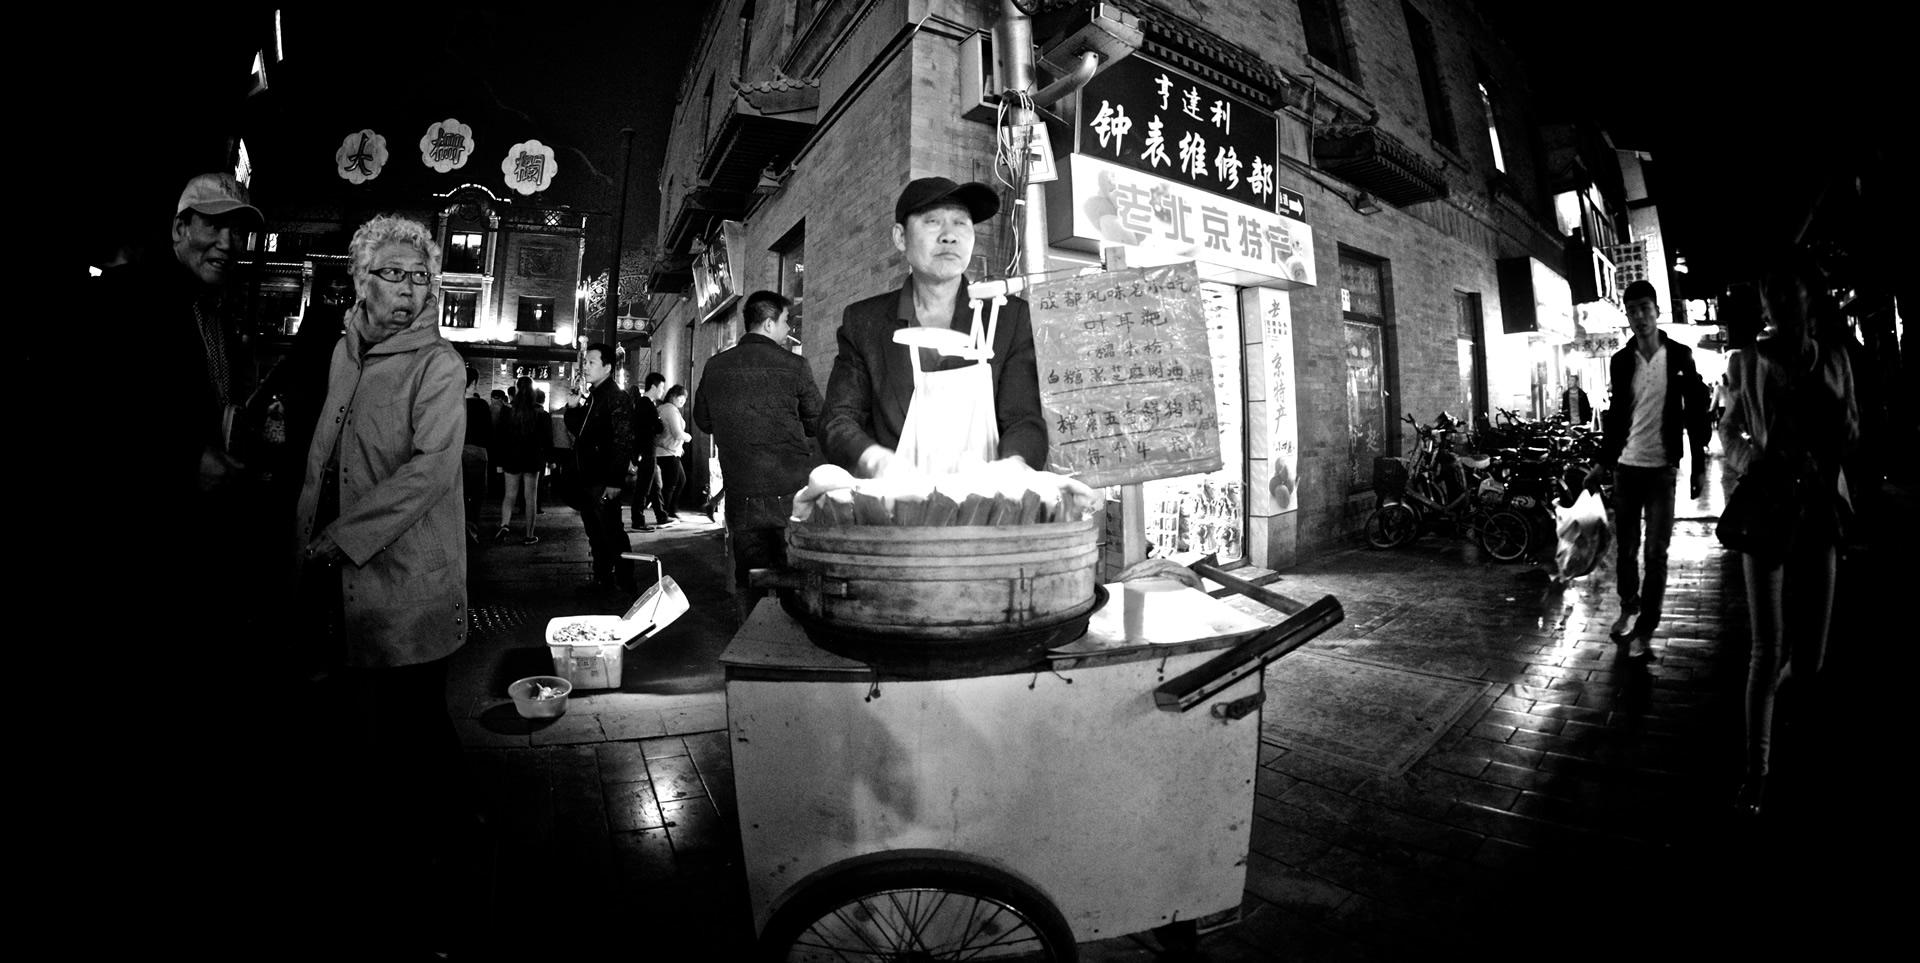 street photography, street photographer, Fujifilm,